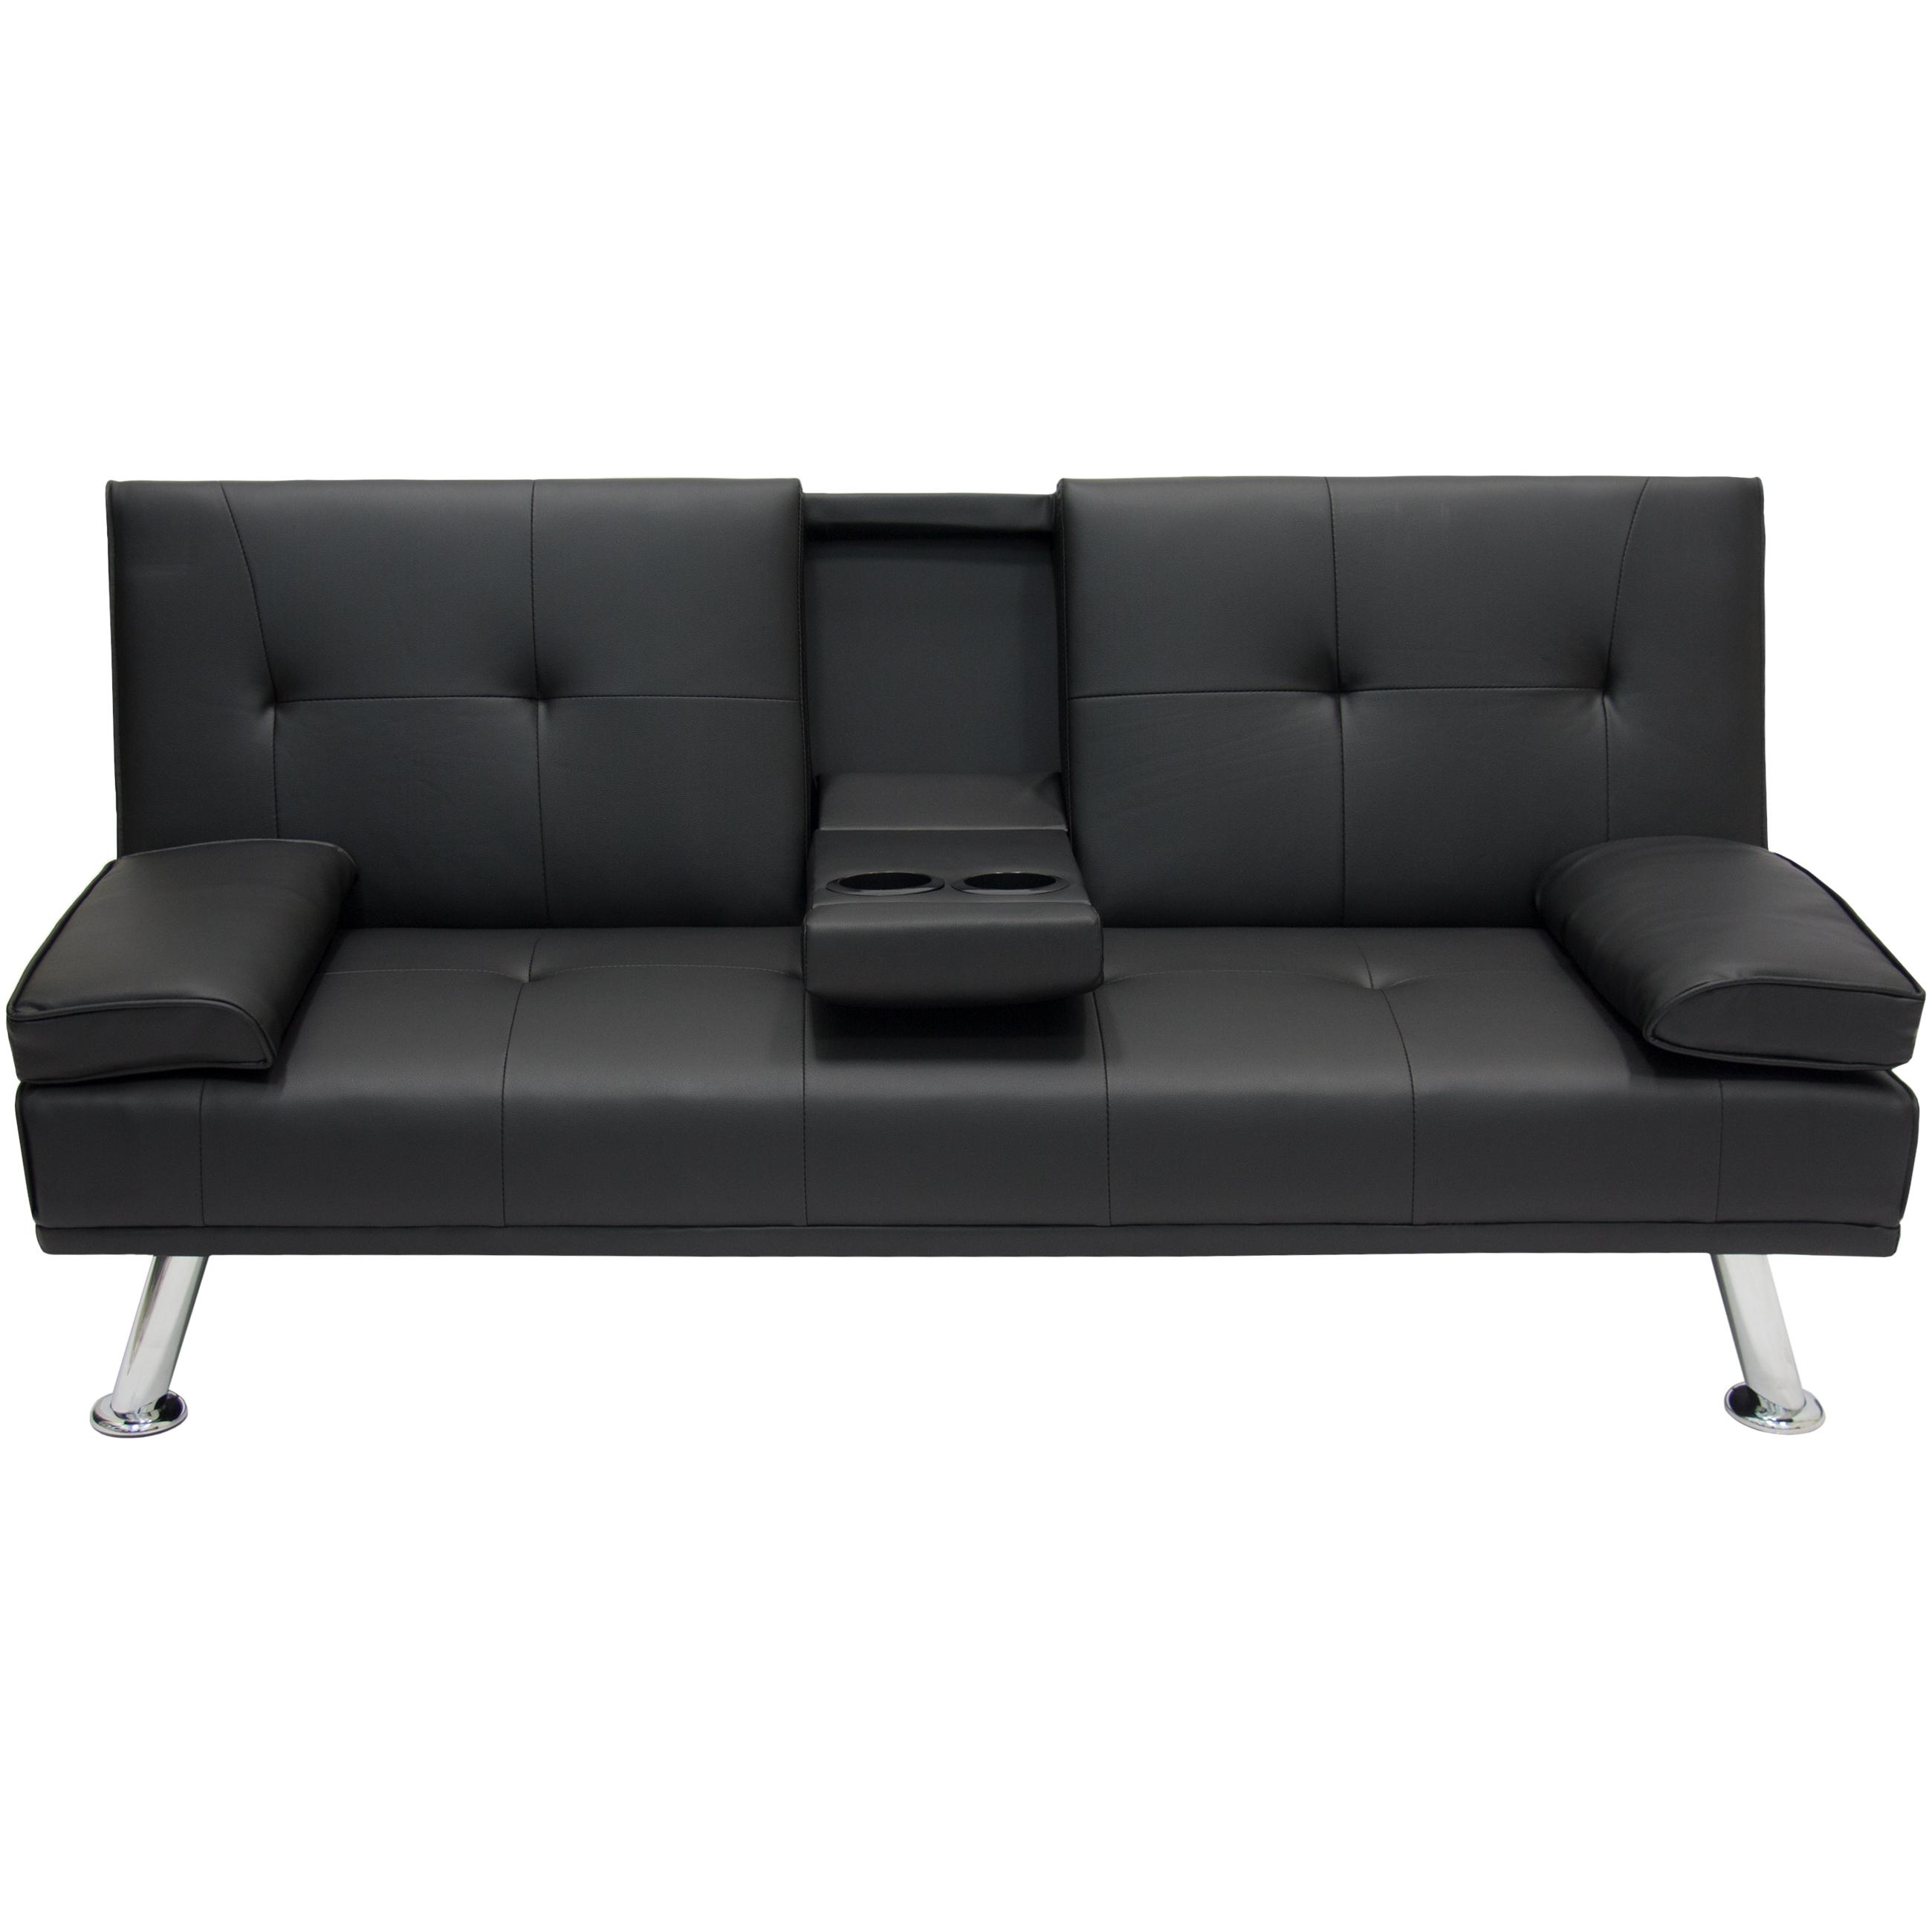 Best Convertible Futon Chair: Entertainment Furniture Futon Sofa Bed Fold Up Down